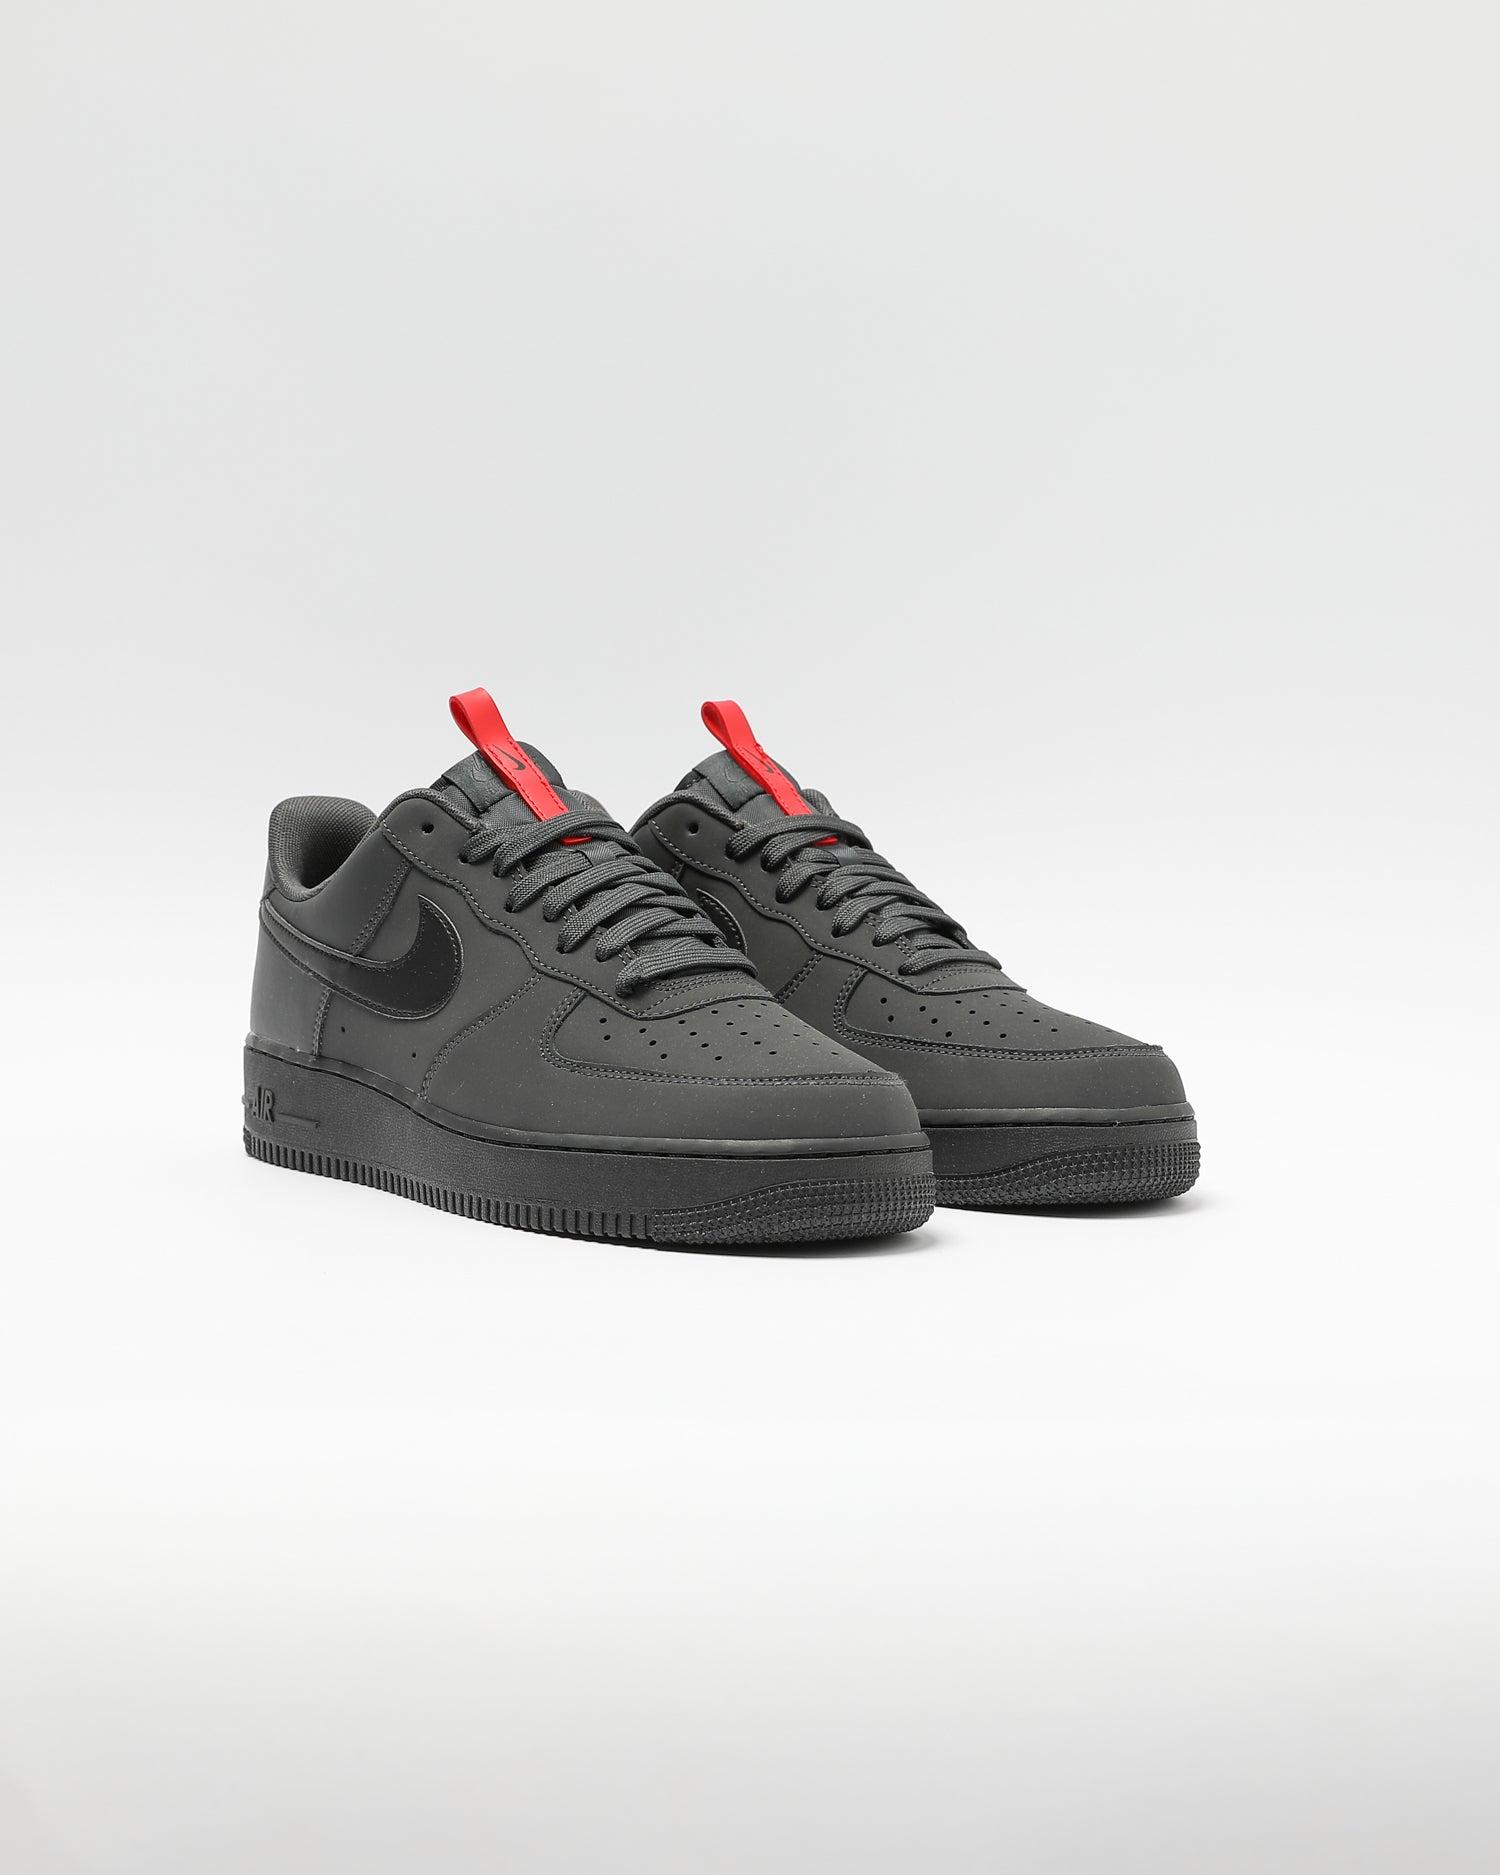 nike air force 1 black grey red